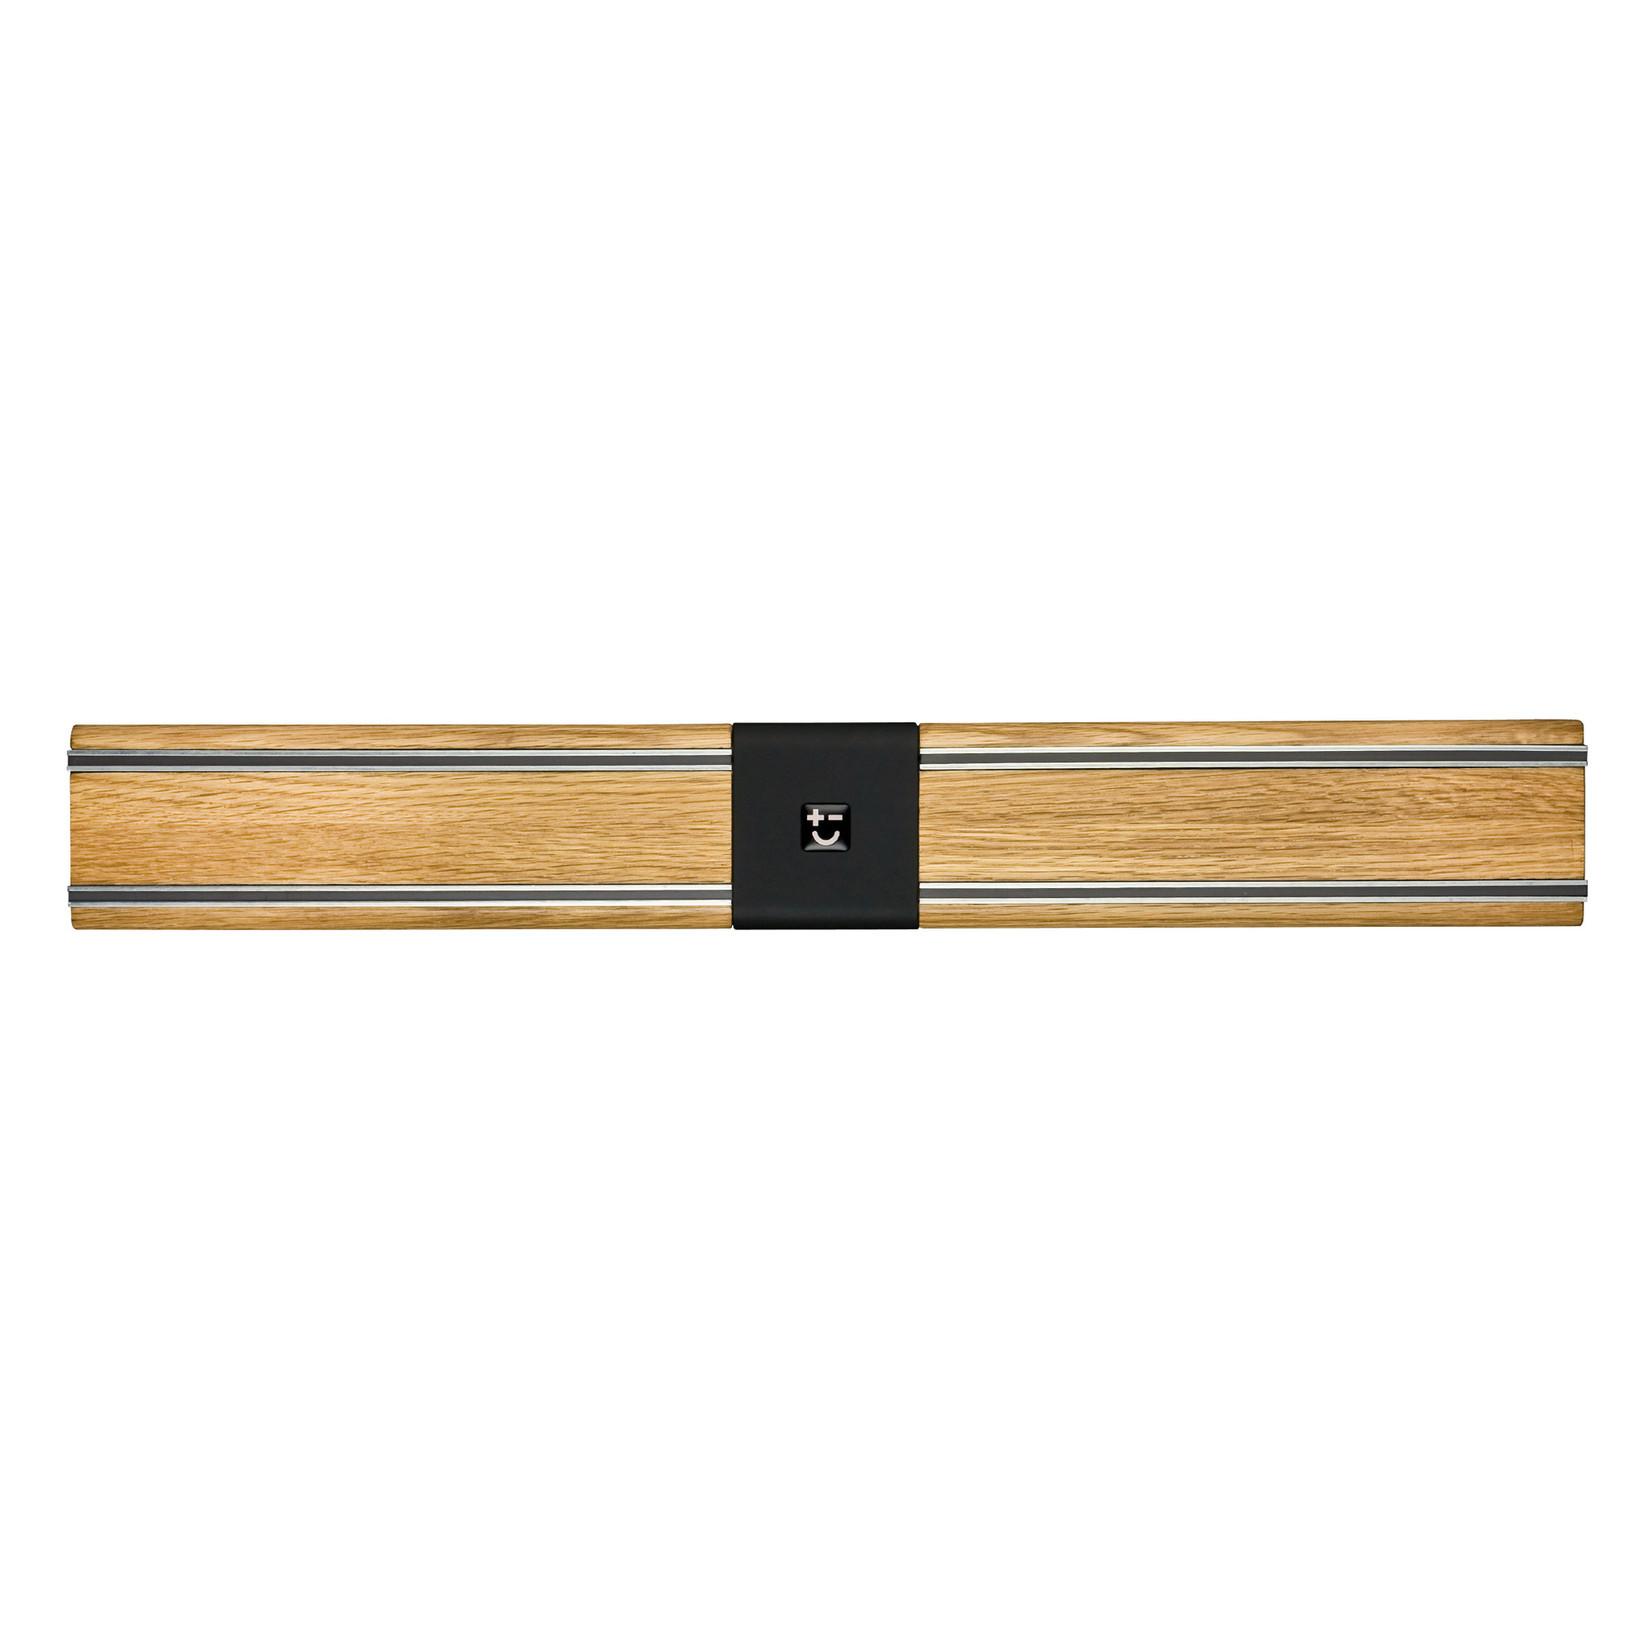 Bisbell Bisbell Magneetstrip Eikenhout 45cm